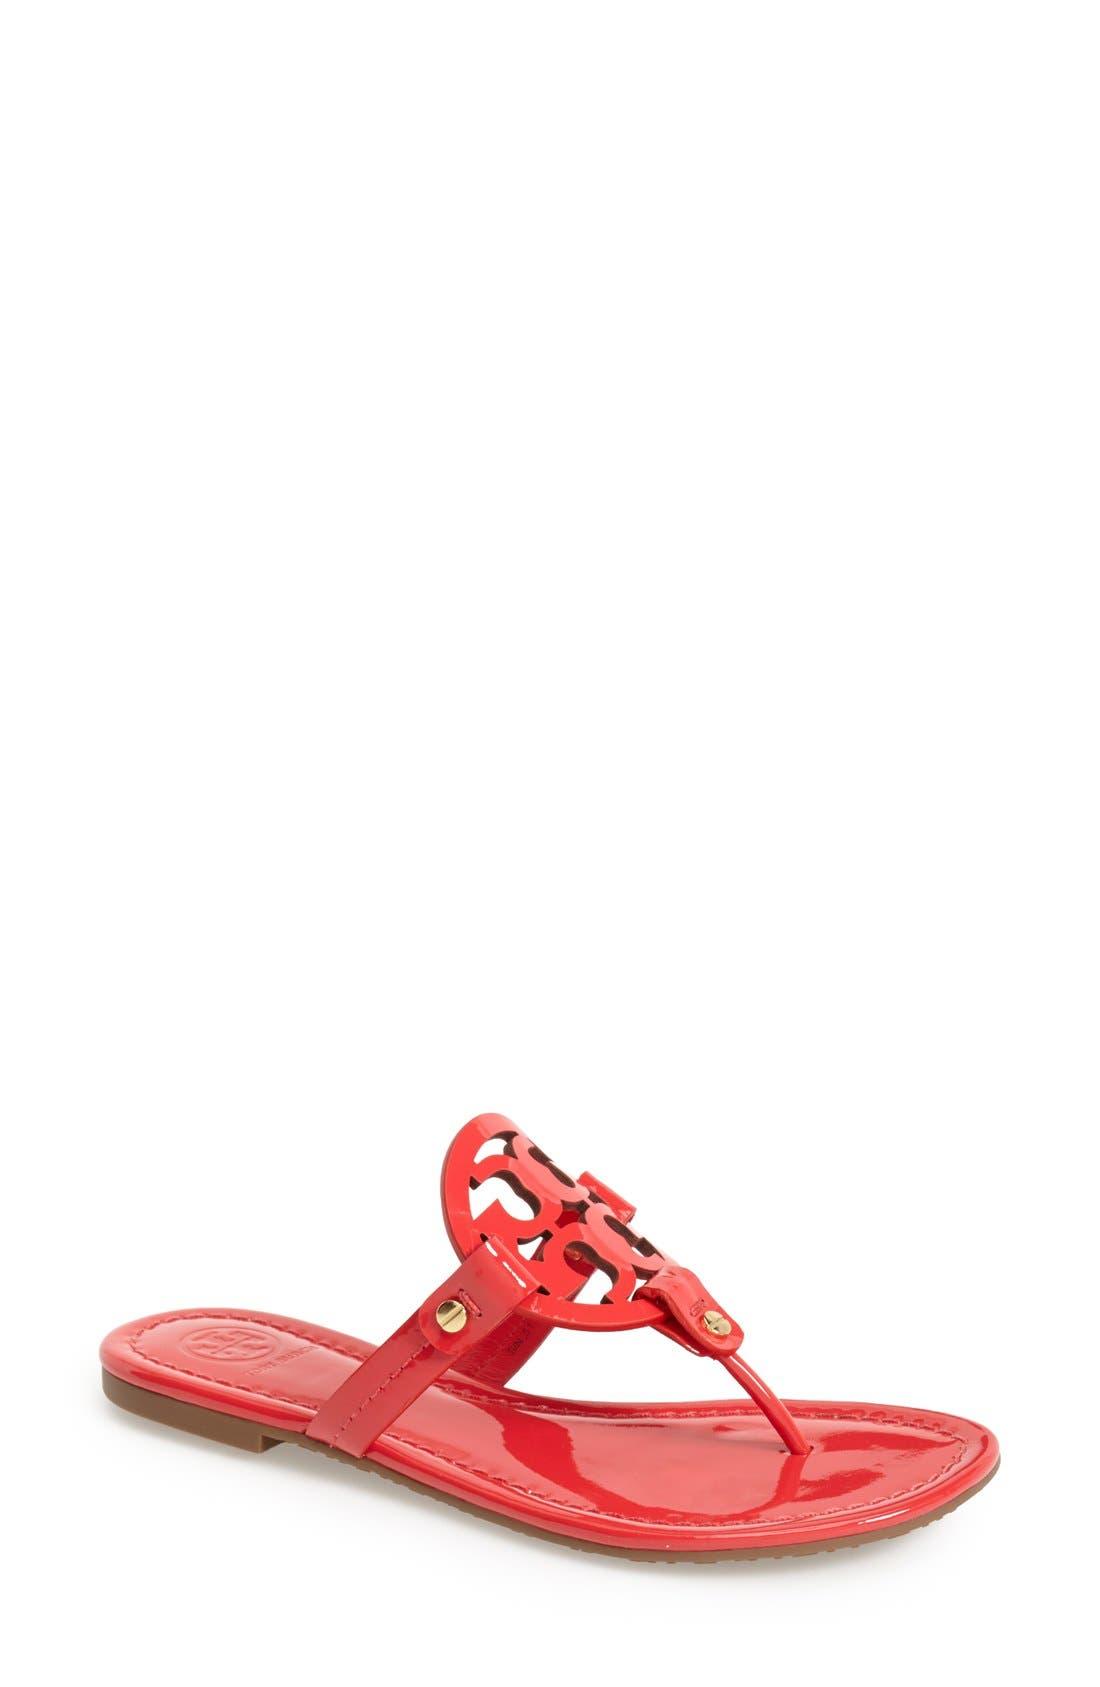 Main Image - Tory Burch 'Miller' Sandal (Women) (Nordstrom Exclusive)